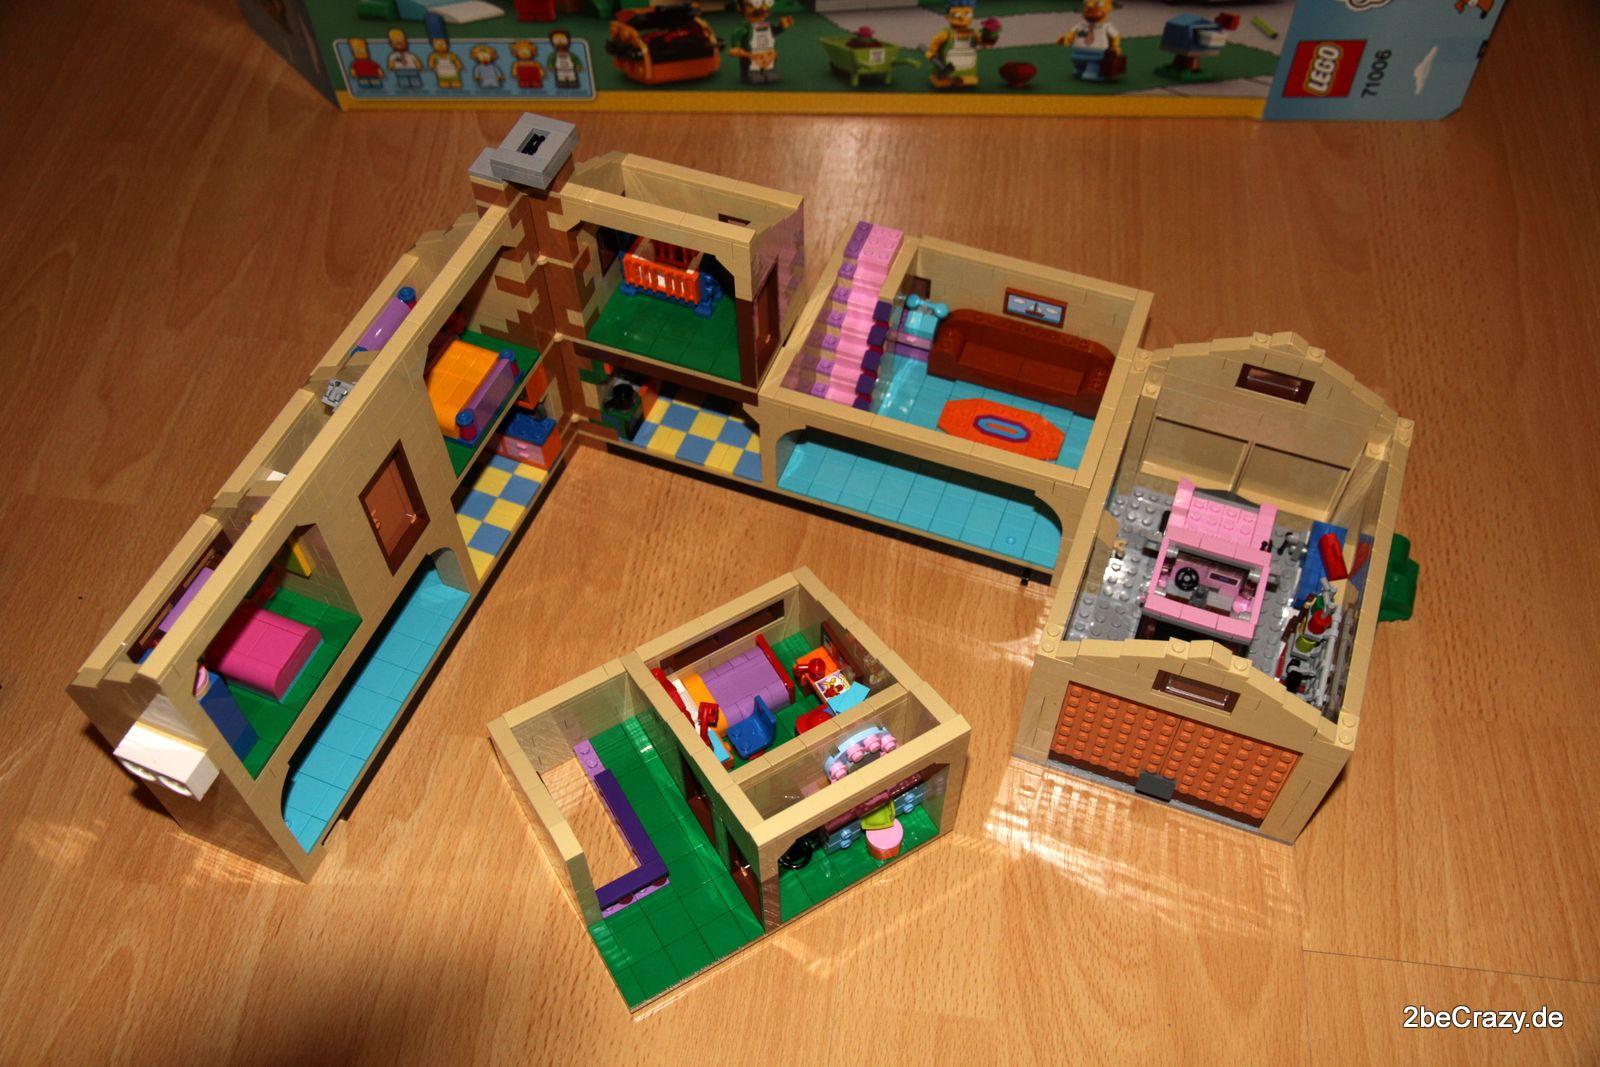 simpsons haus lego 86 2becrazy. Black Bedroom Furniture Sets. Home Design Ideas